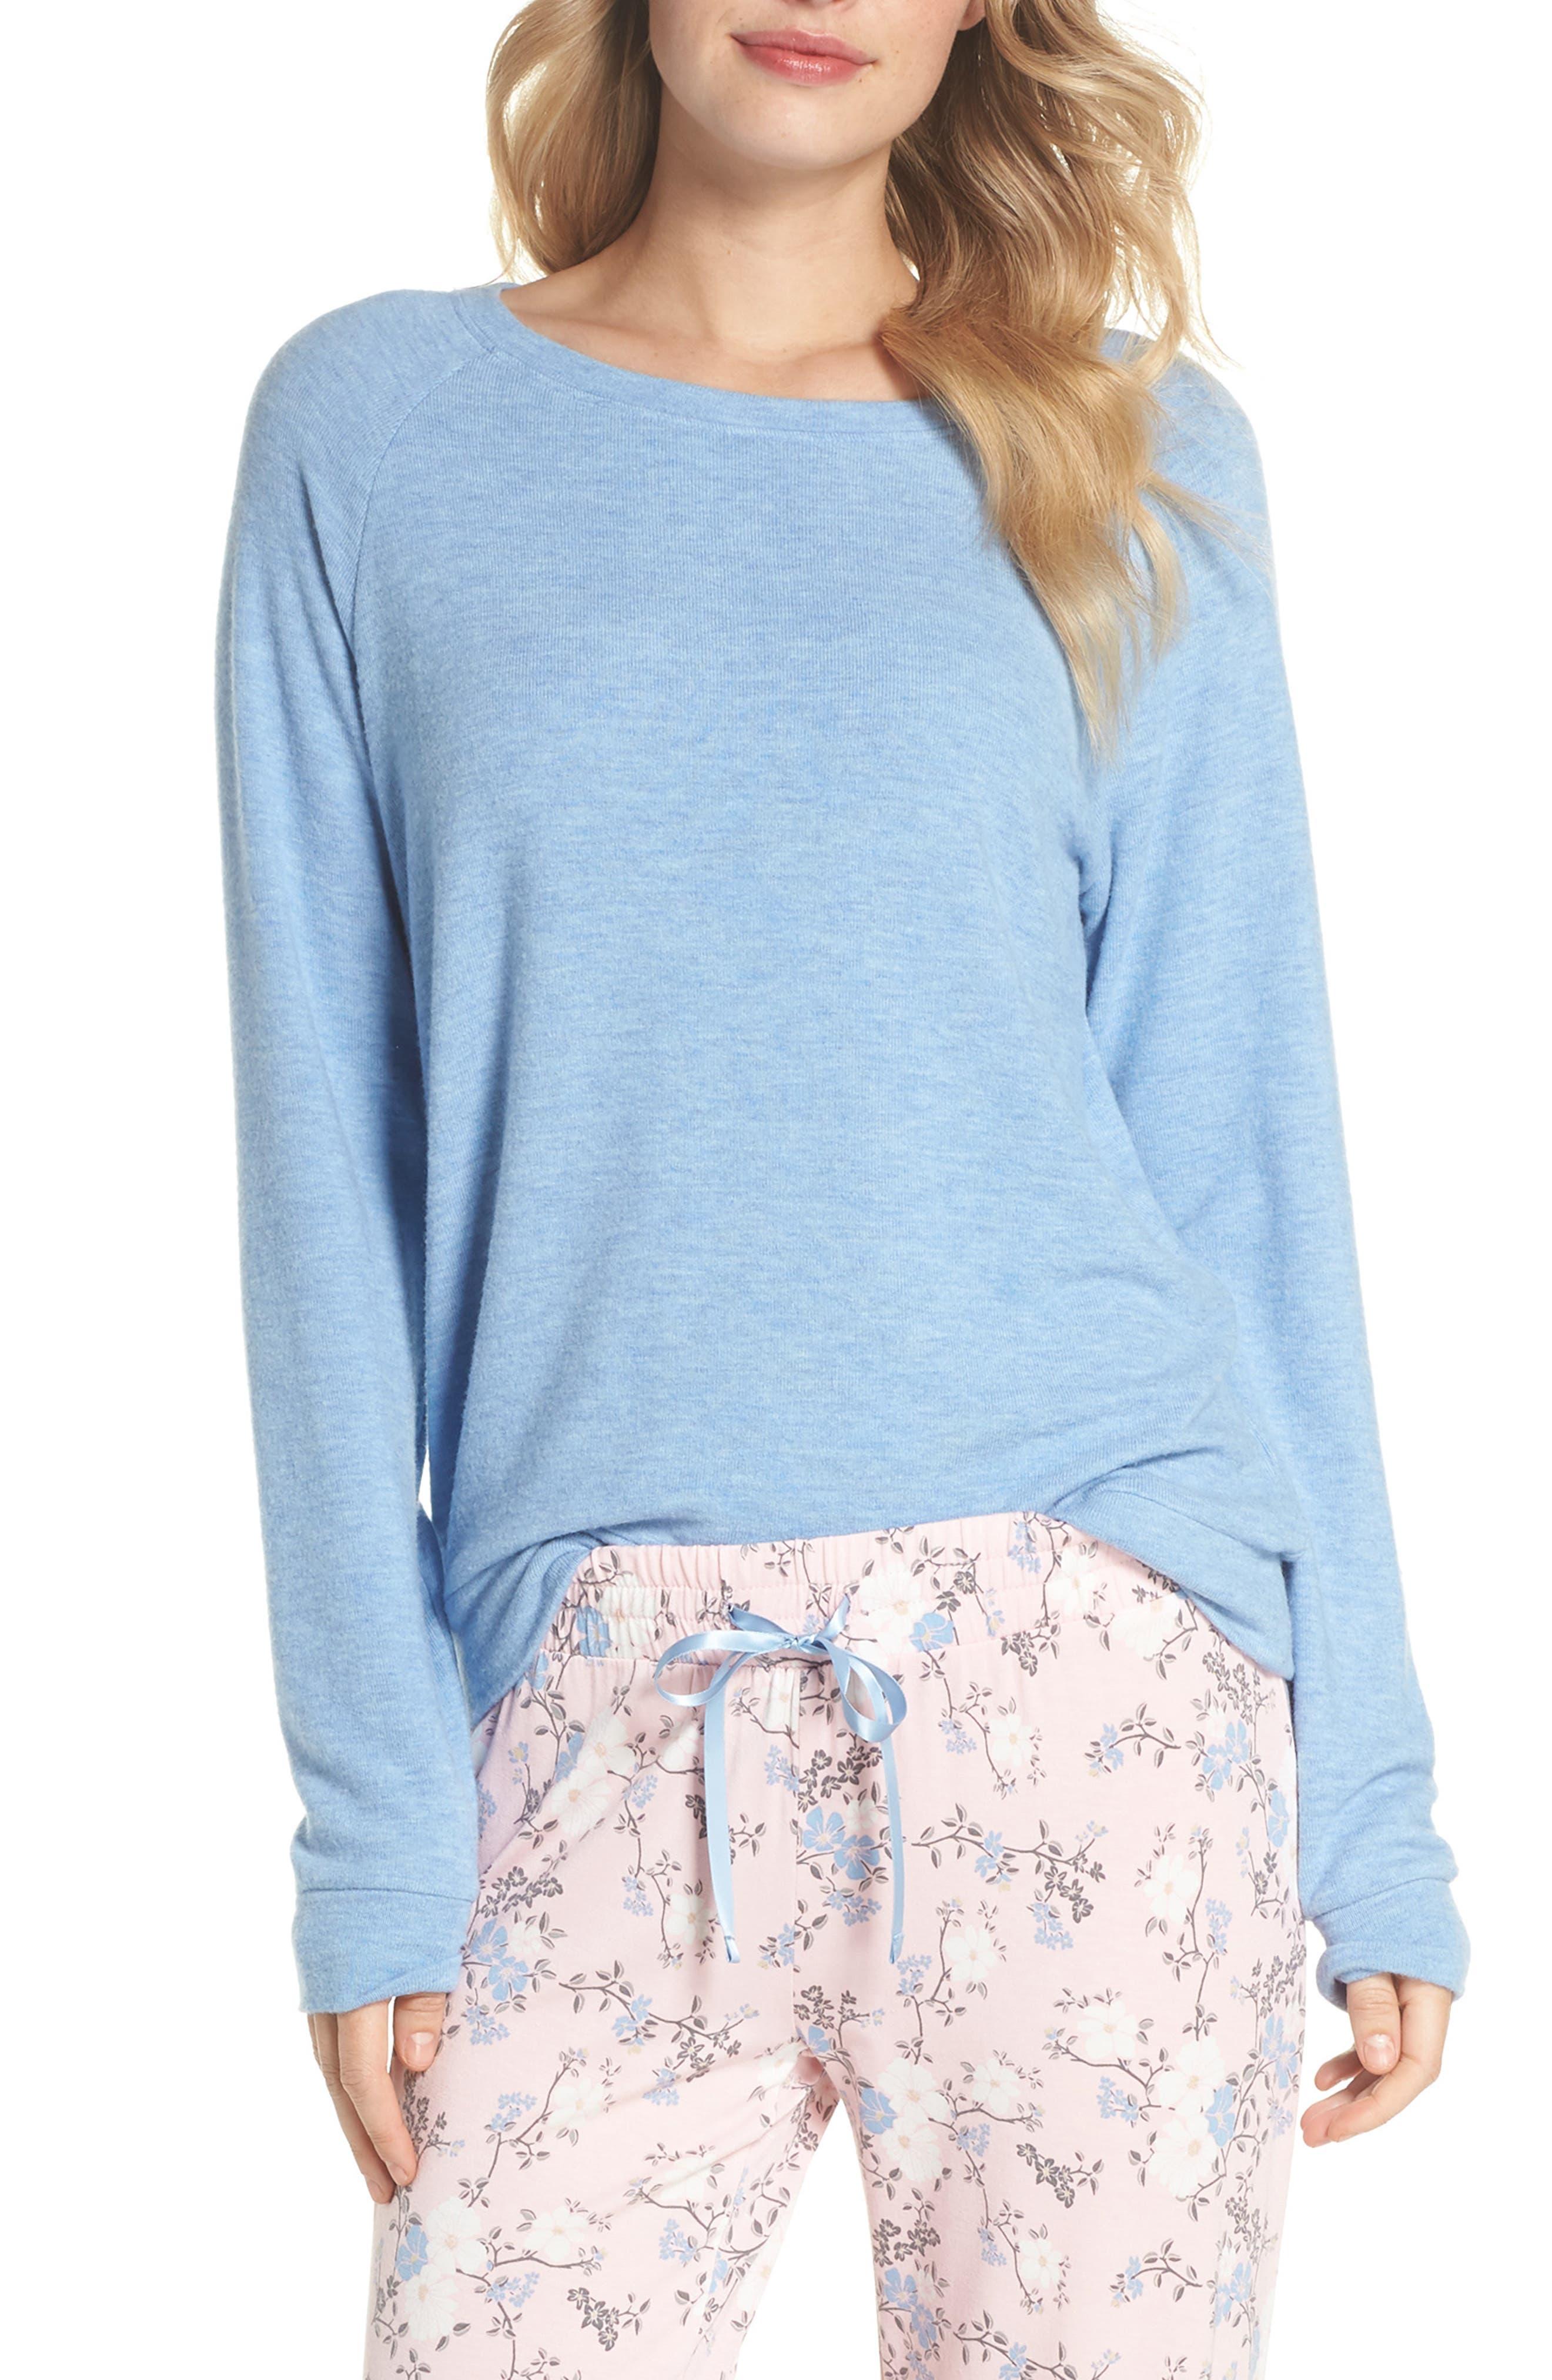 Peachy Pajama Shirt,                         Main,                         color, Blue